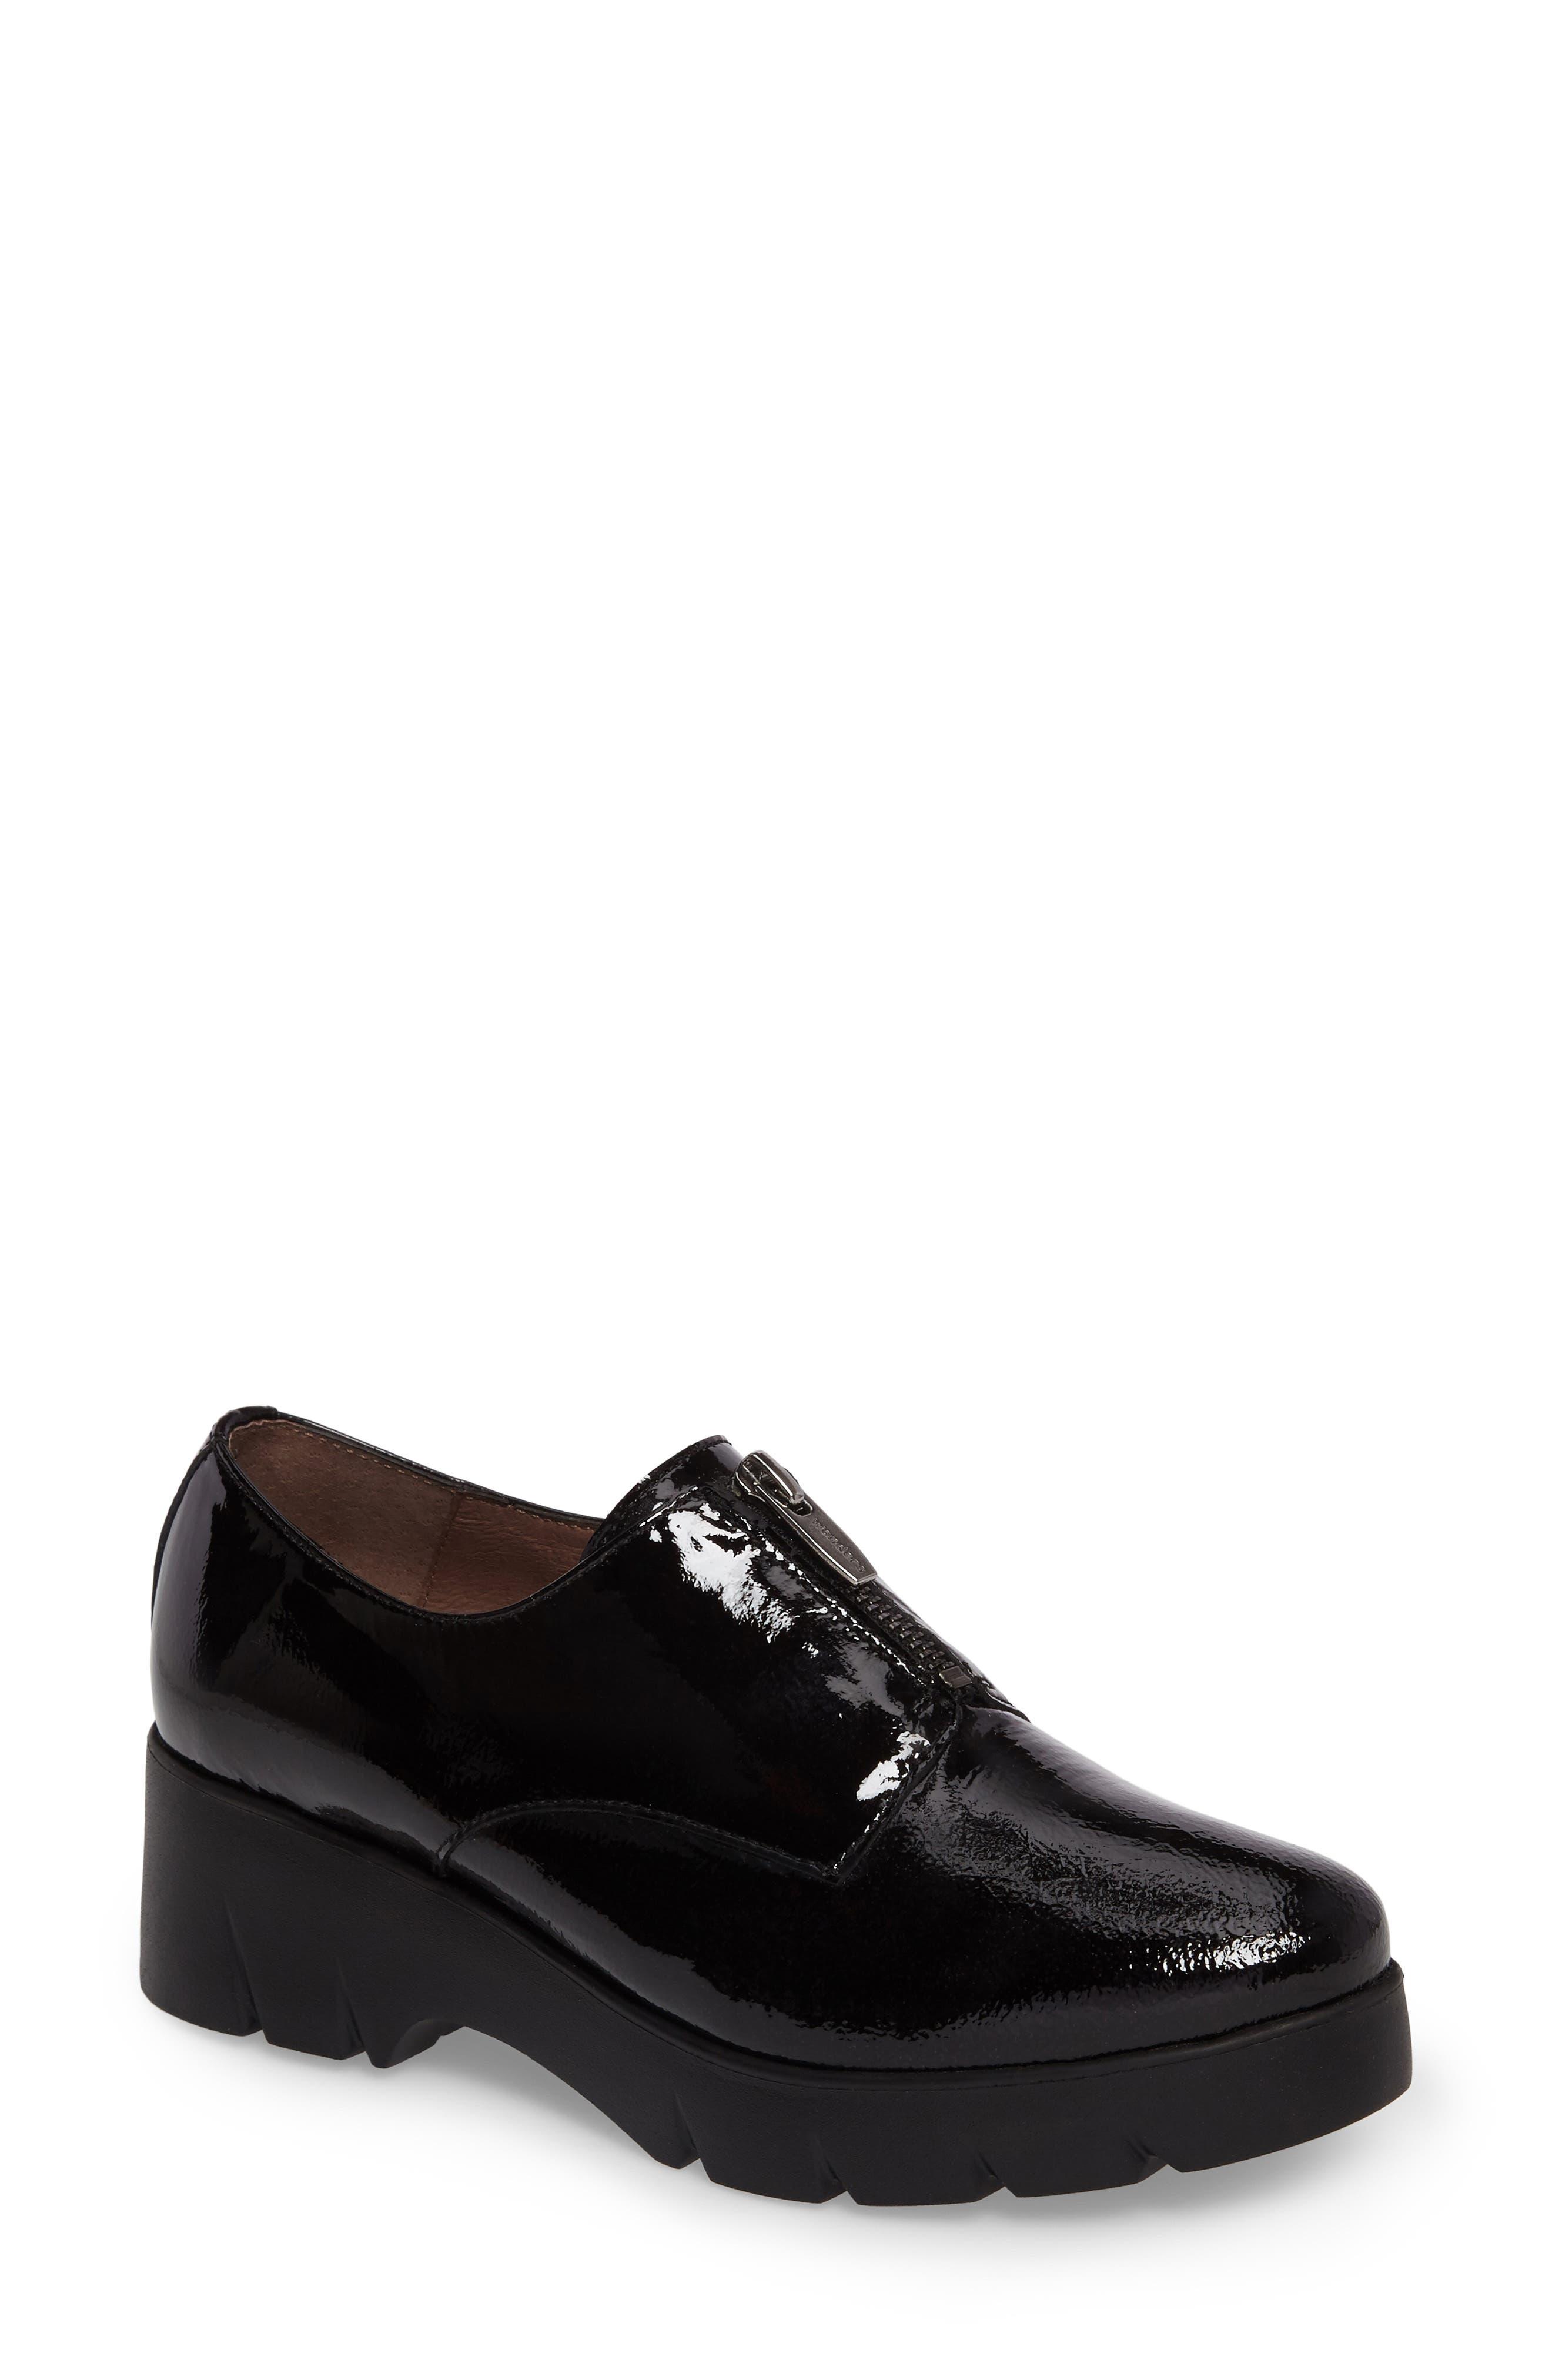 Platform Derby,                         Main,                         color, Black Patent Leather